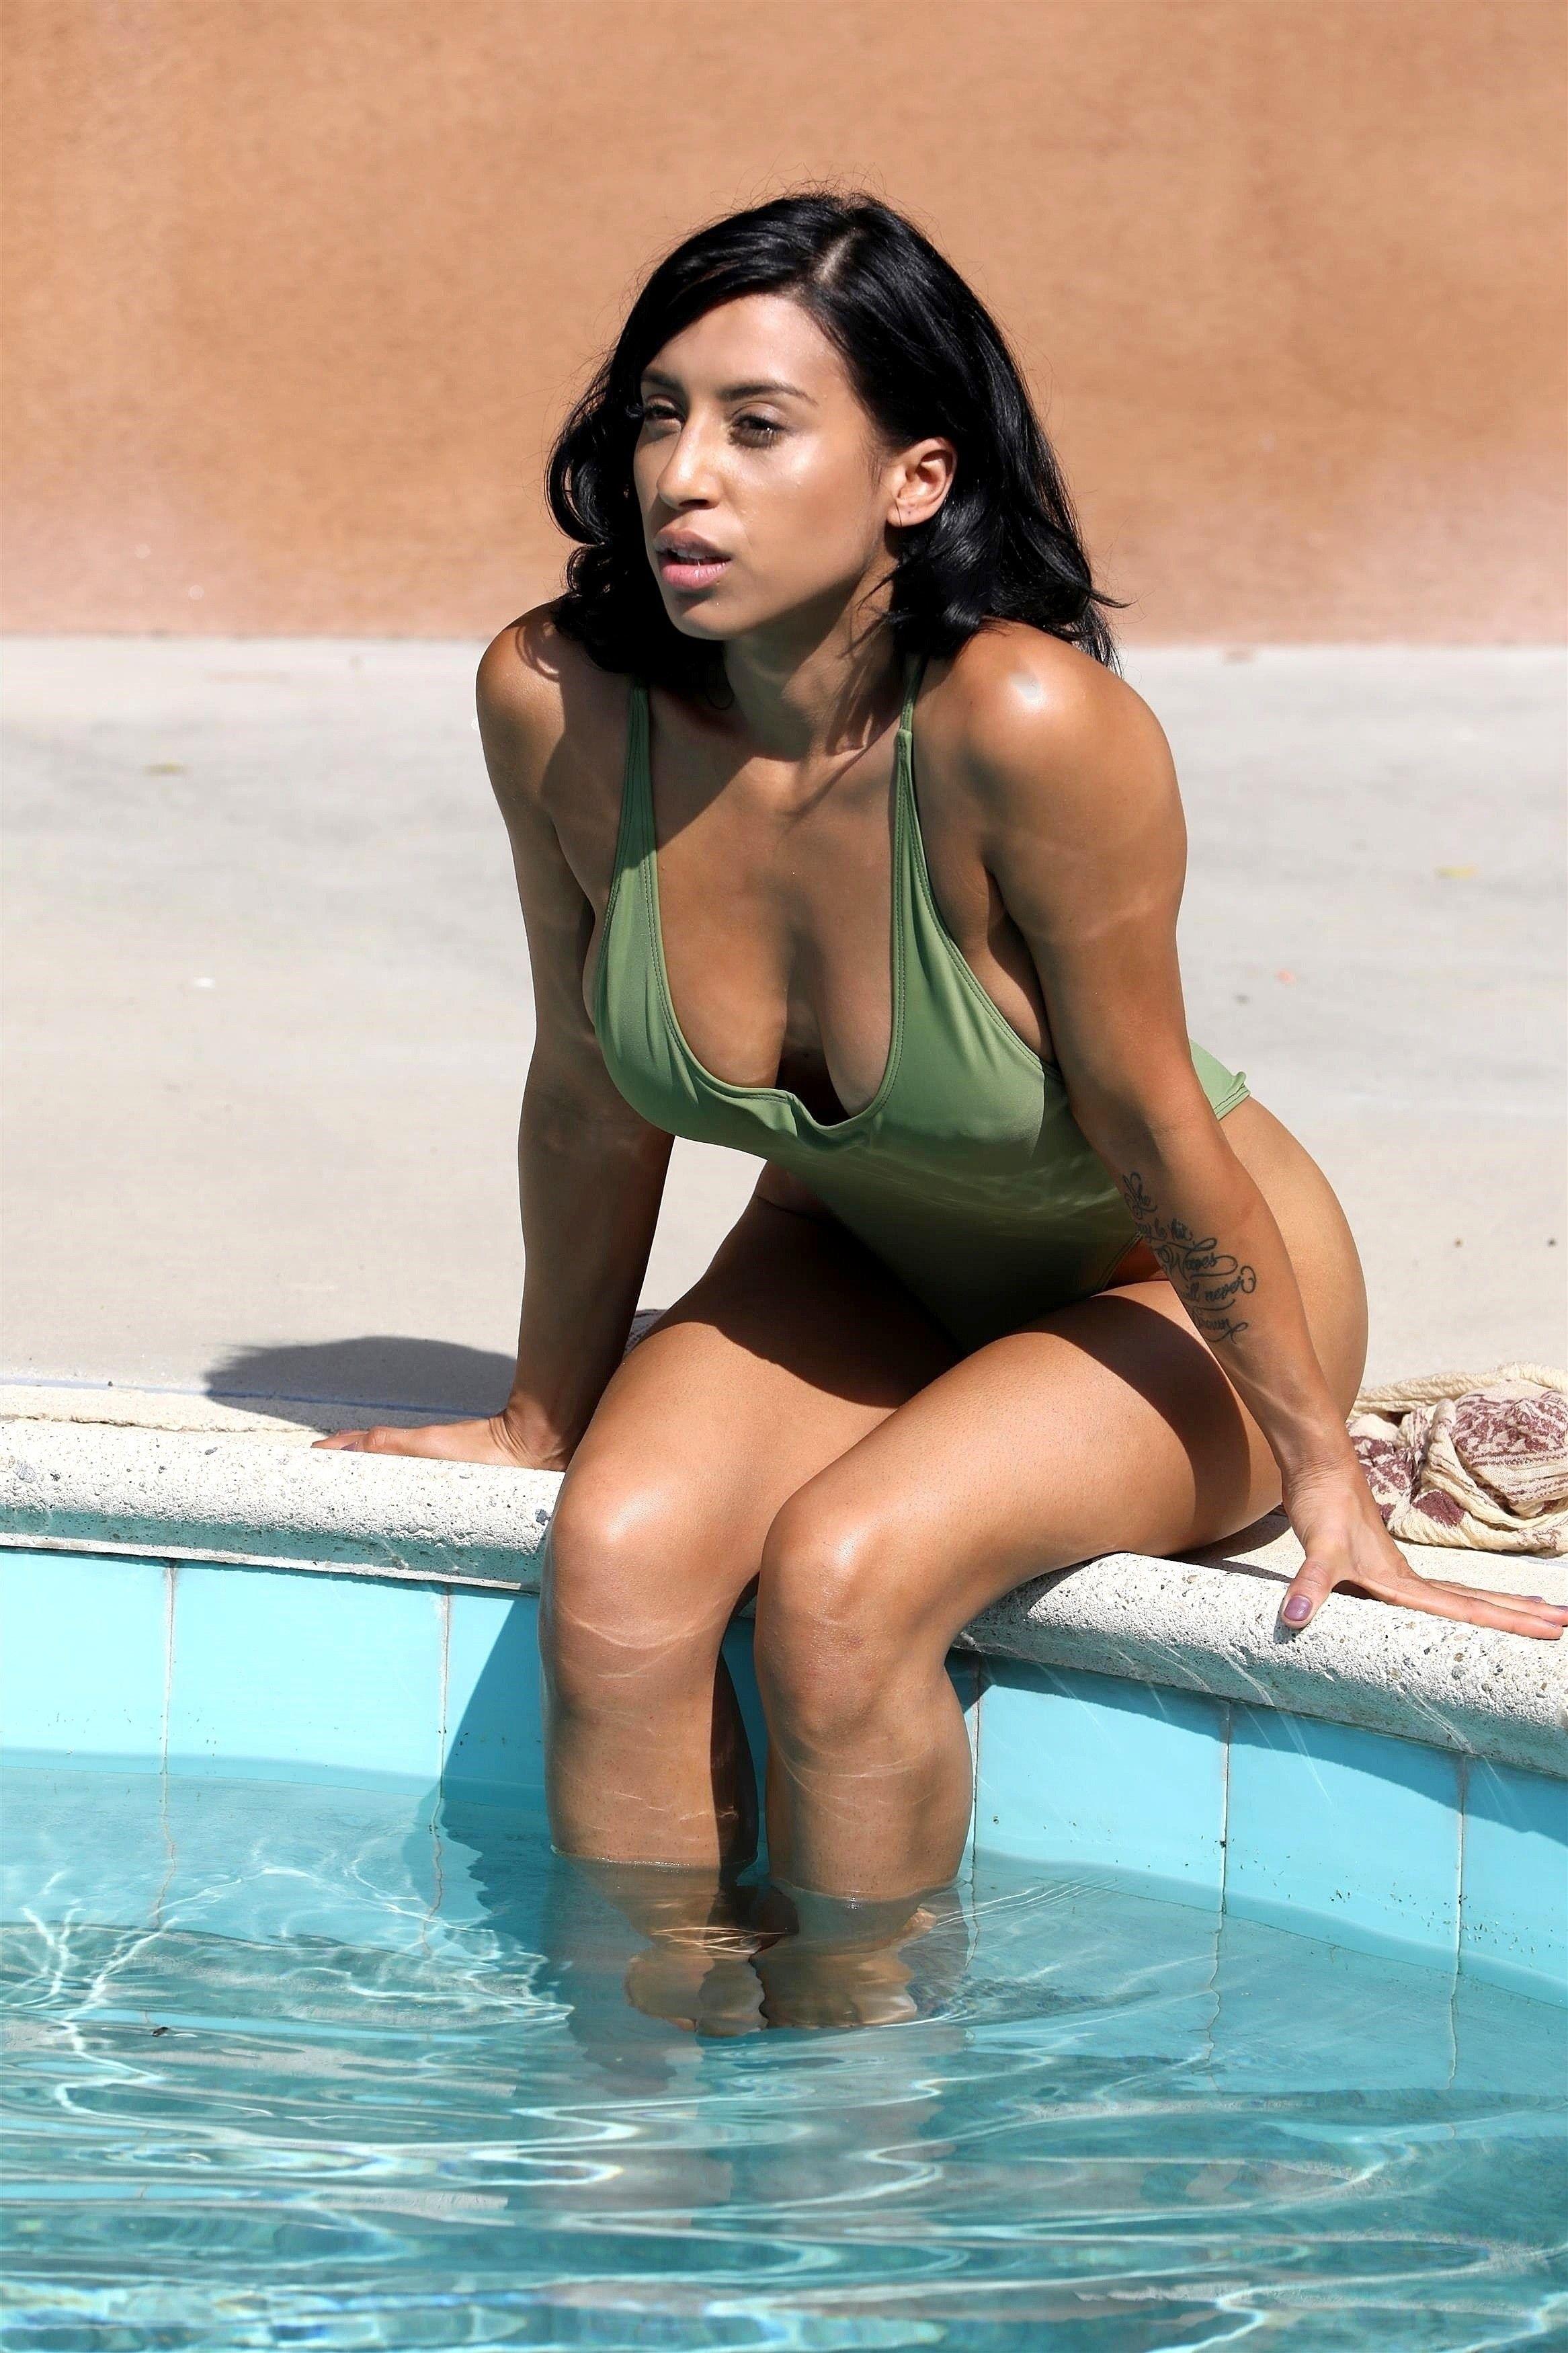 Erotica Montia Sabbag nudes (26 photo), Pussy, Bikini, Selfie, in bikini 2020